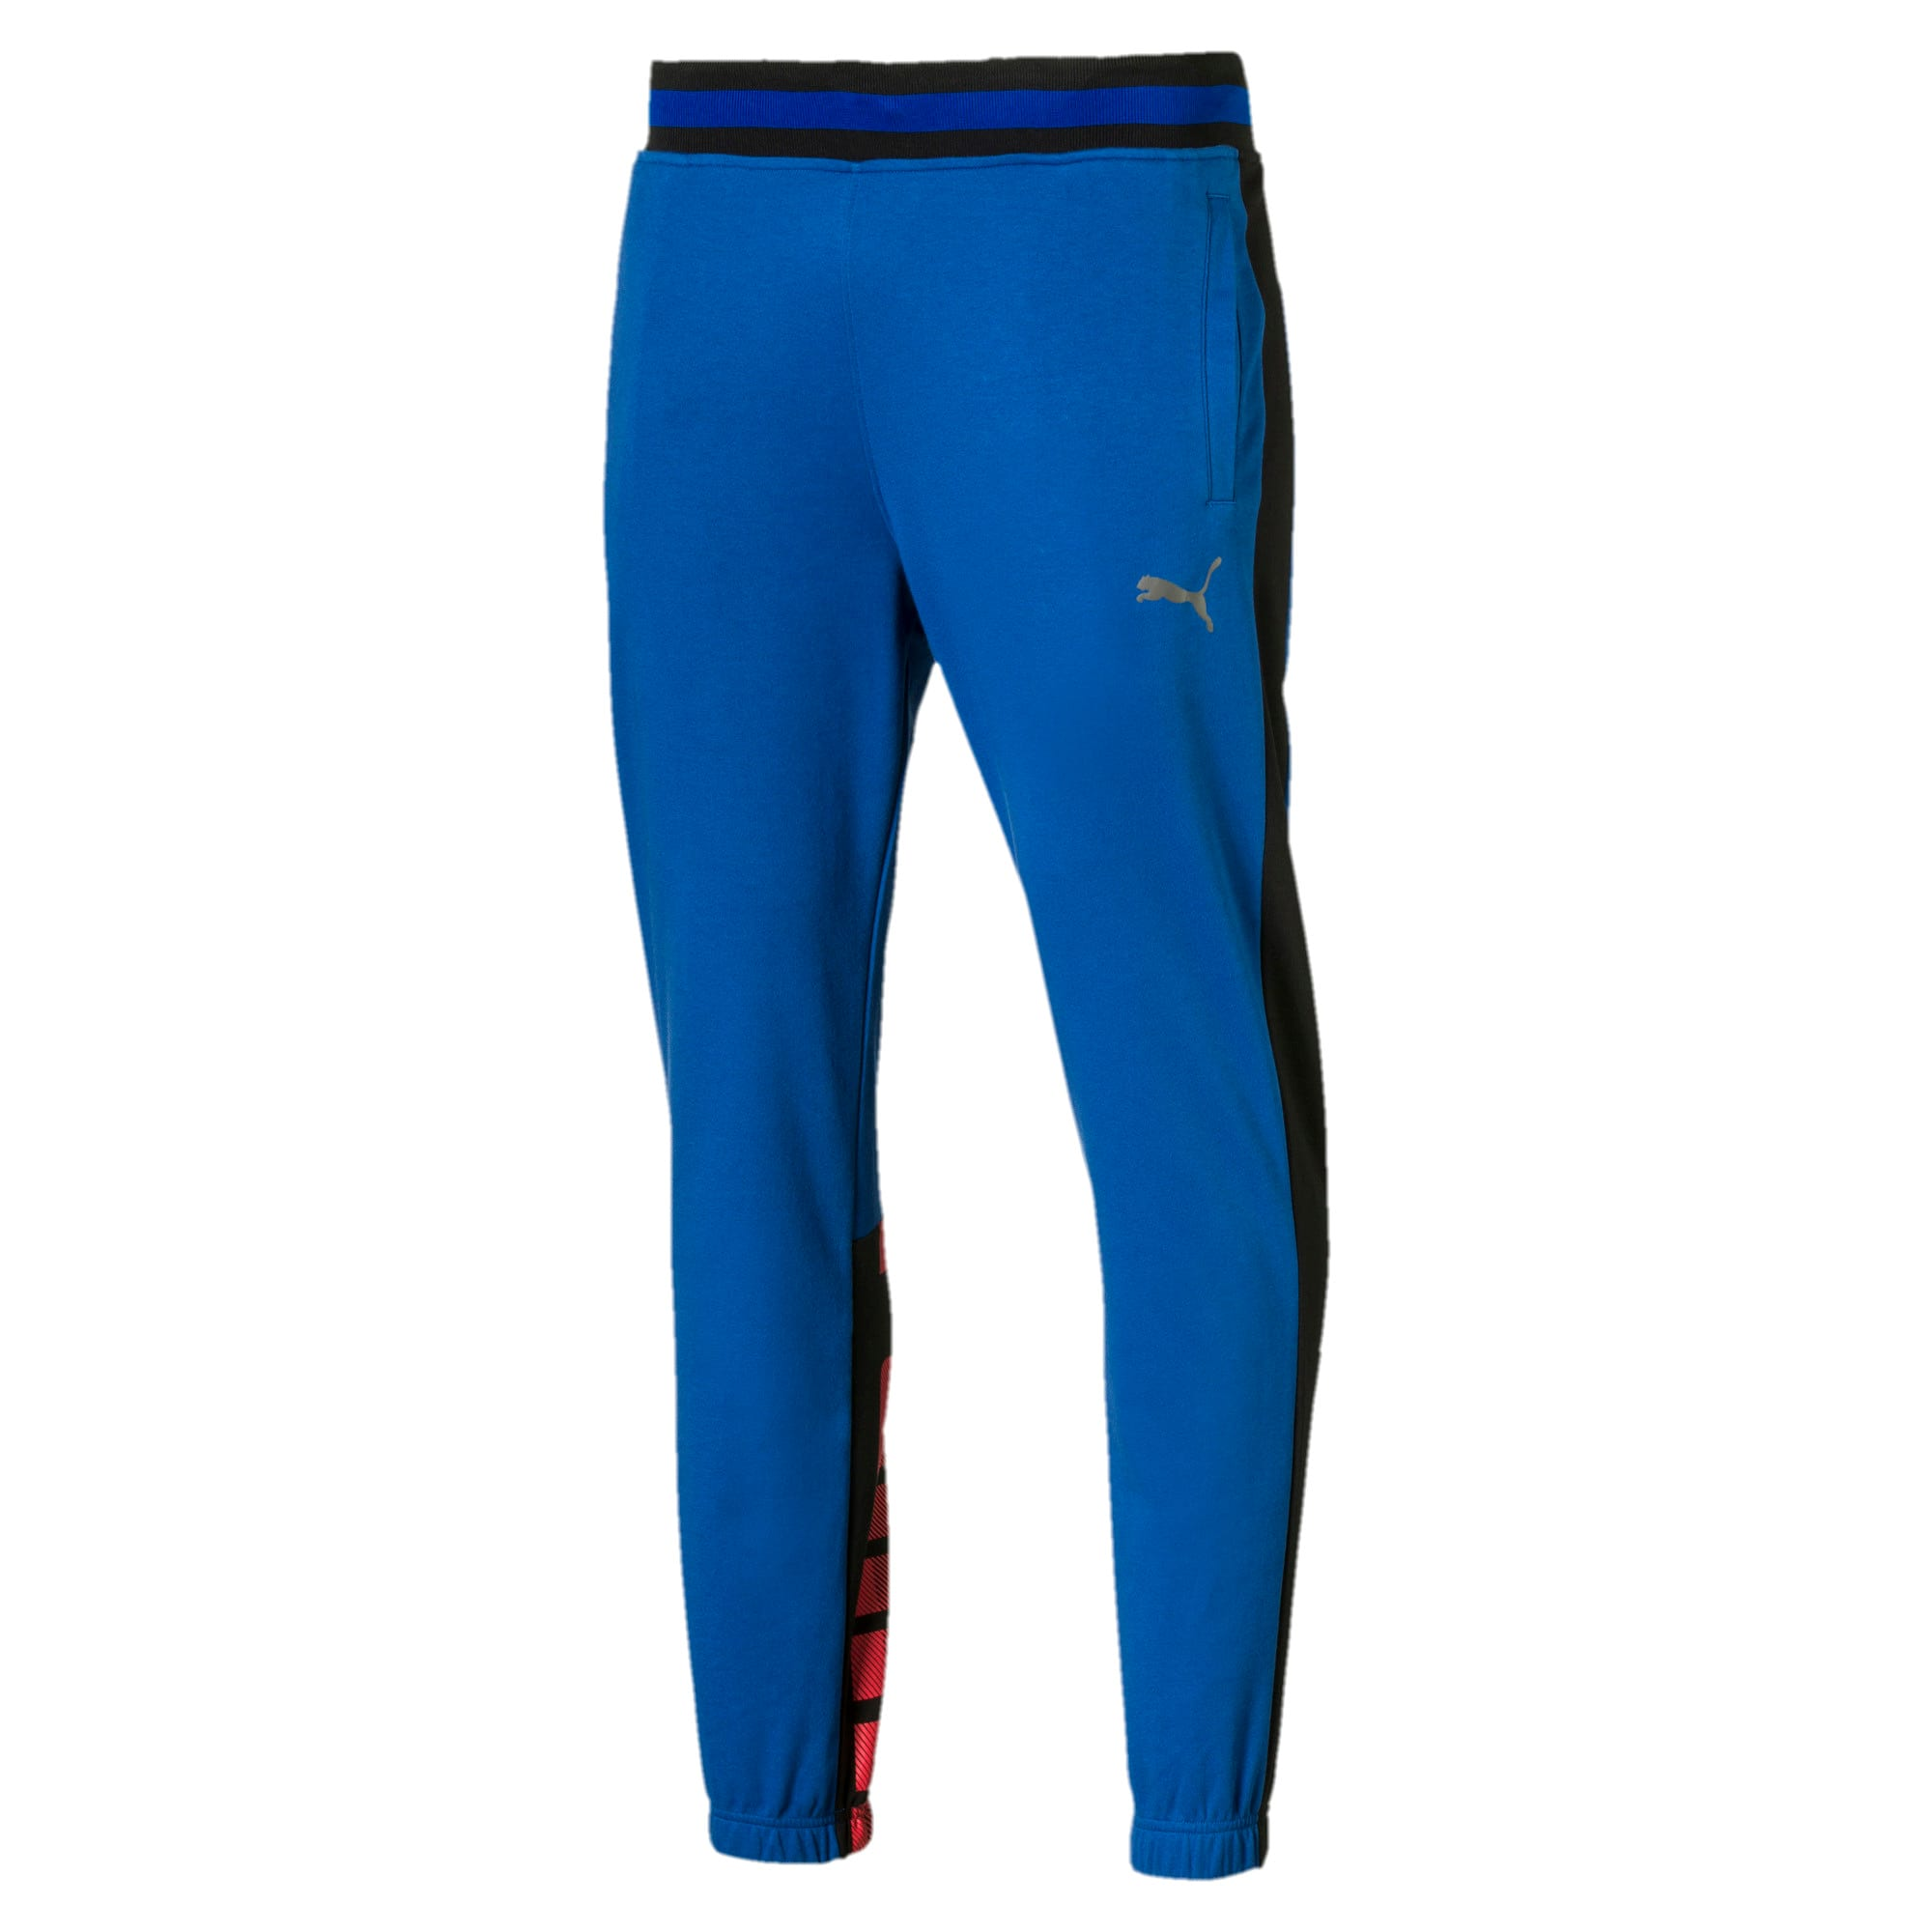 Thumbnail 1 of Collective Men's Sweatpants, Galaxy Blue, medium